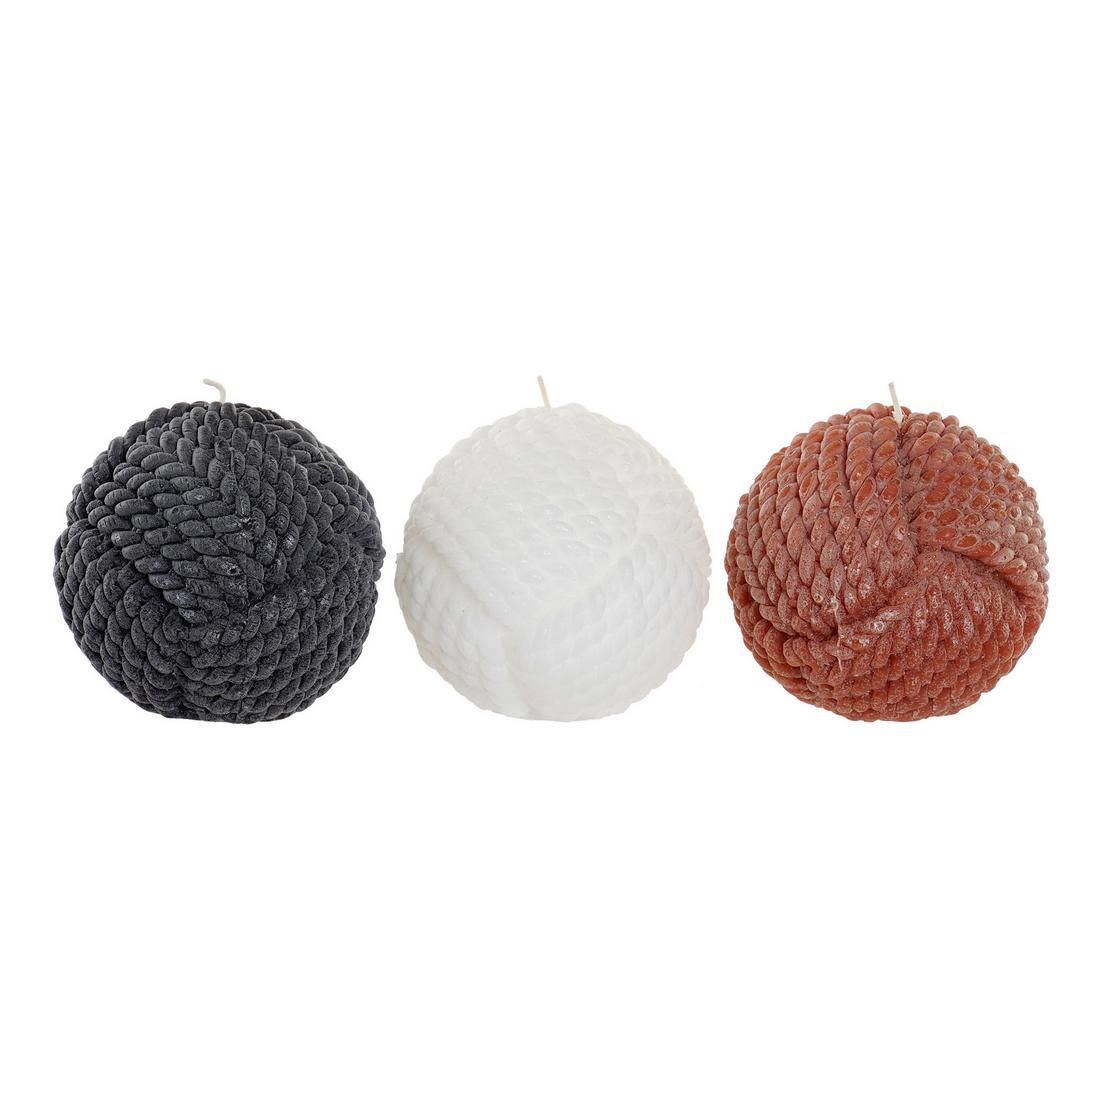 Candle DKD Home Decor Ball (3 pcs)